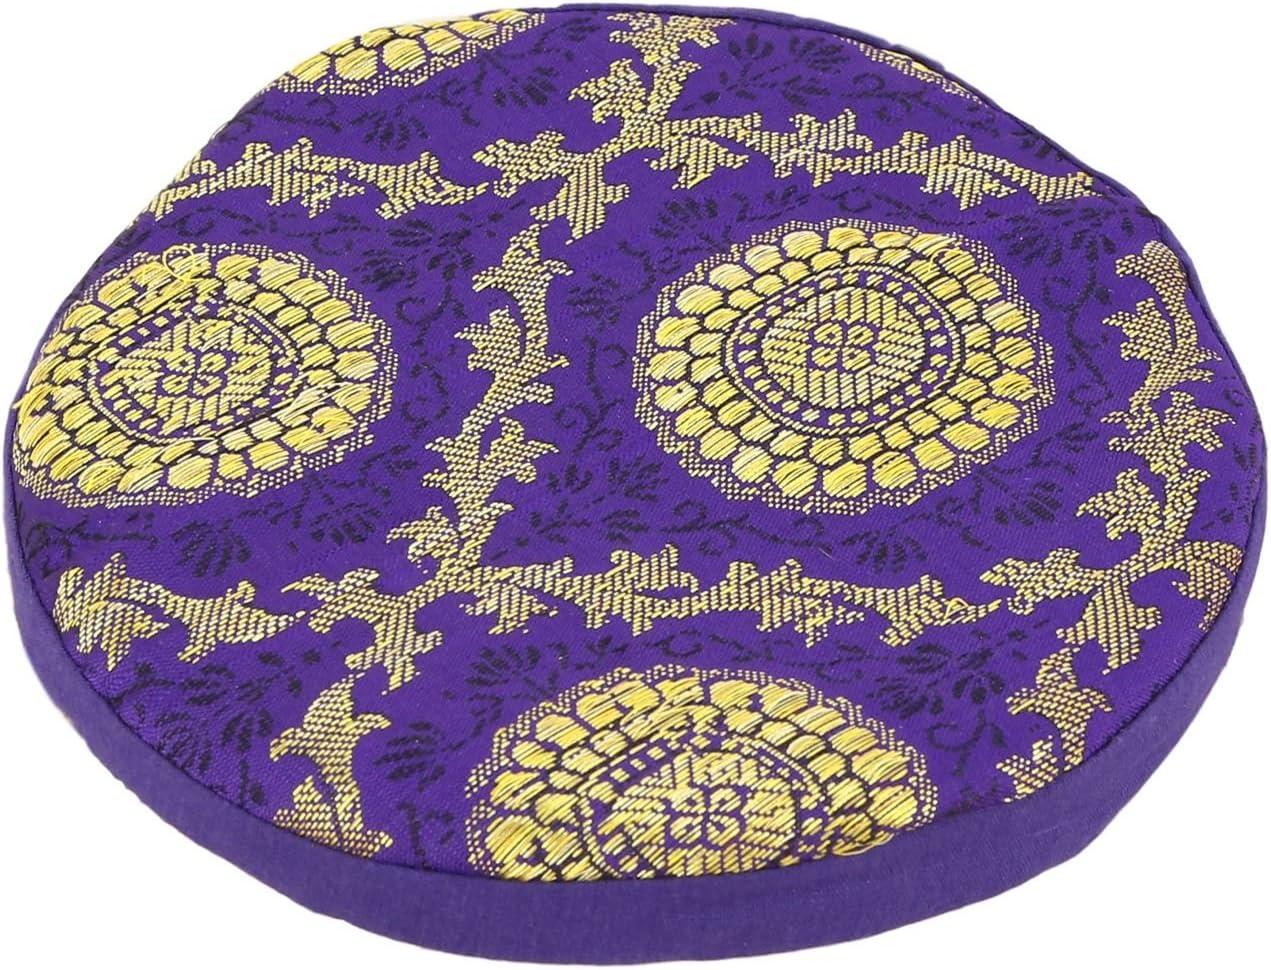 Ayurveda /& Yoga Tuned to the 7th Chakra Crown Chakra ShalinIndia Sahasrara Violet Buddhist Singing Bowl 5 Inches Fine Quality Brass Ideal for Meditations